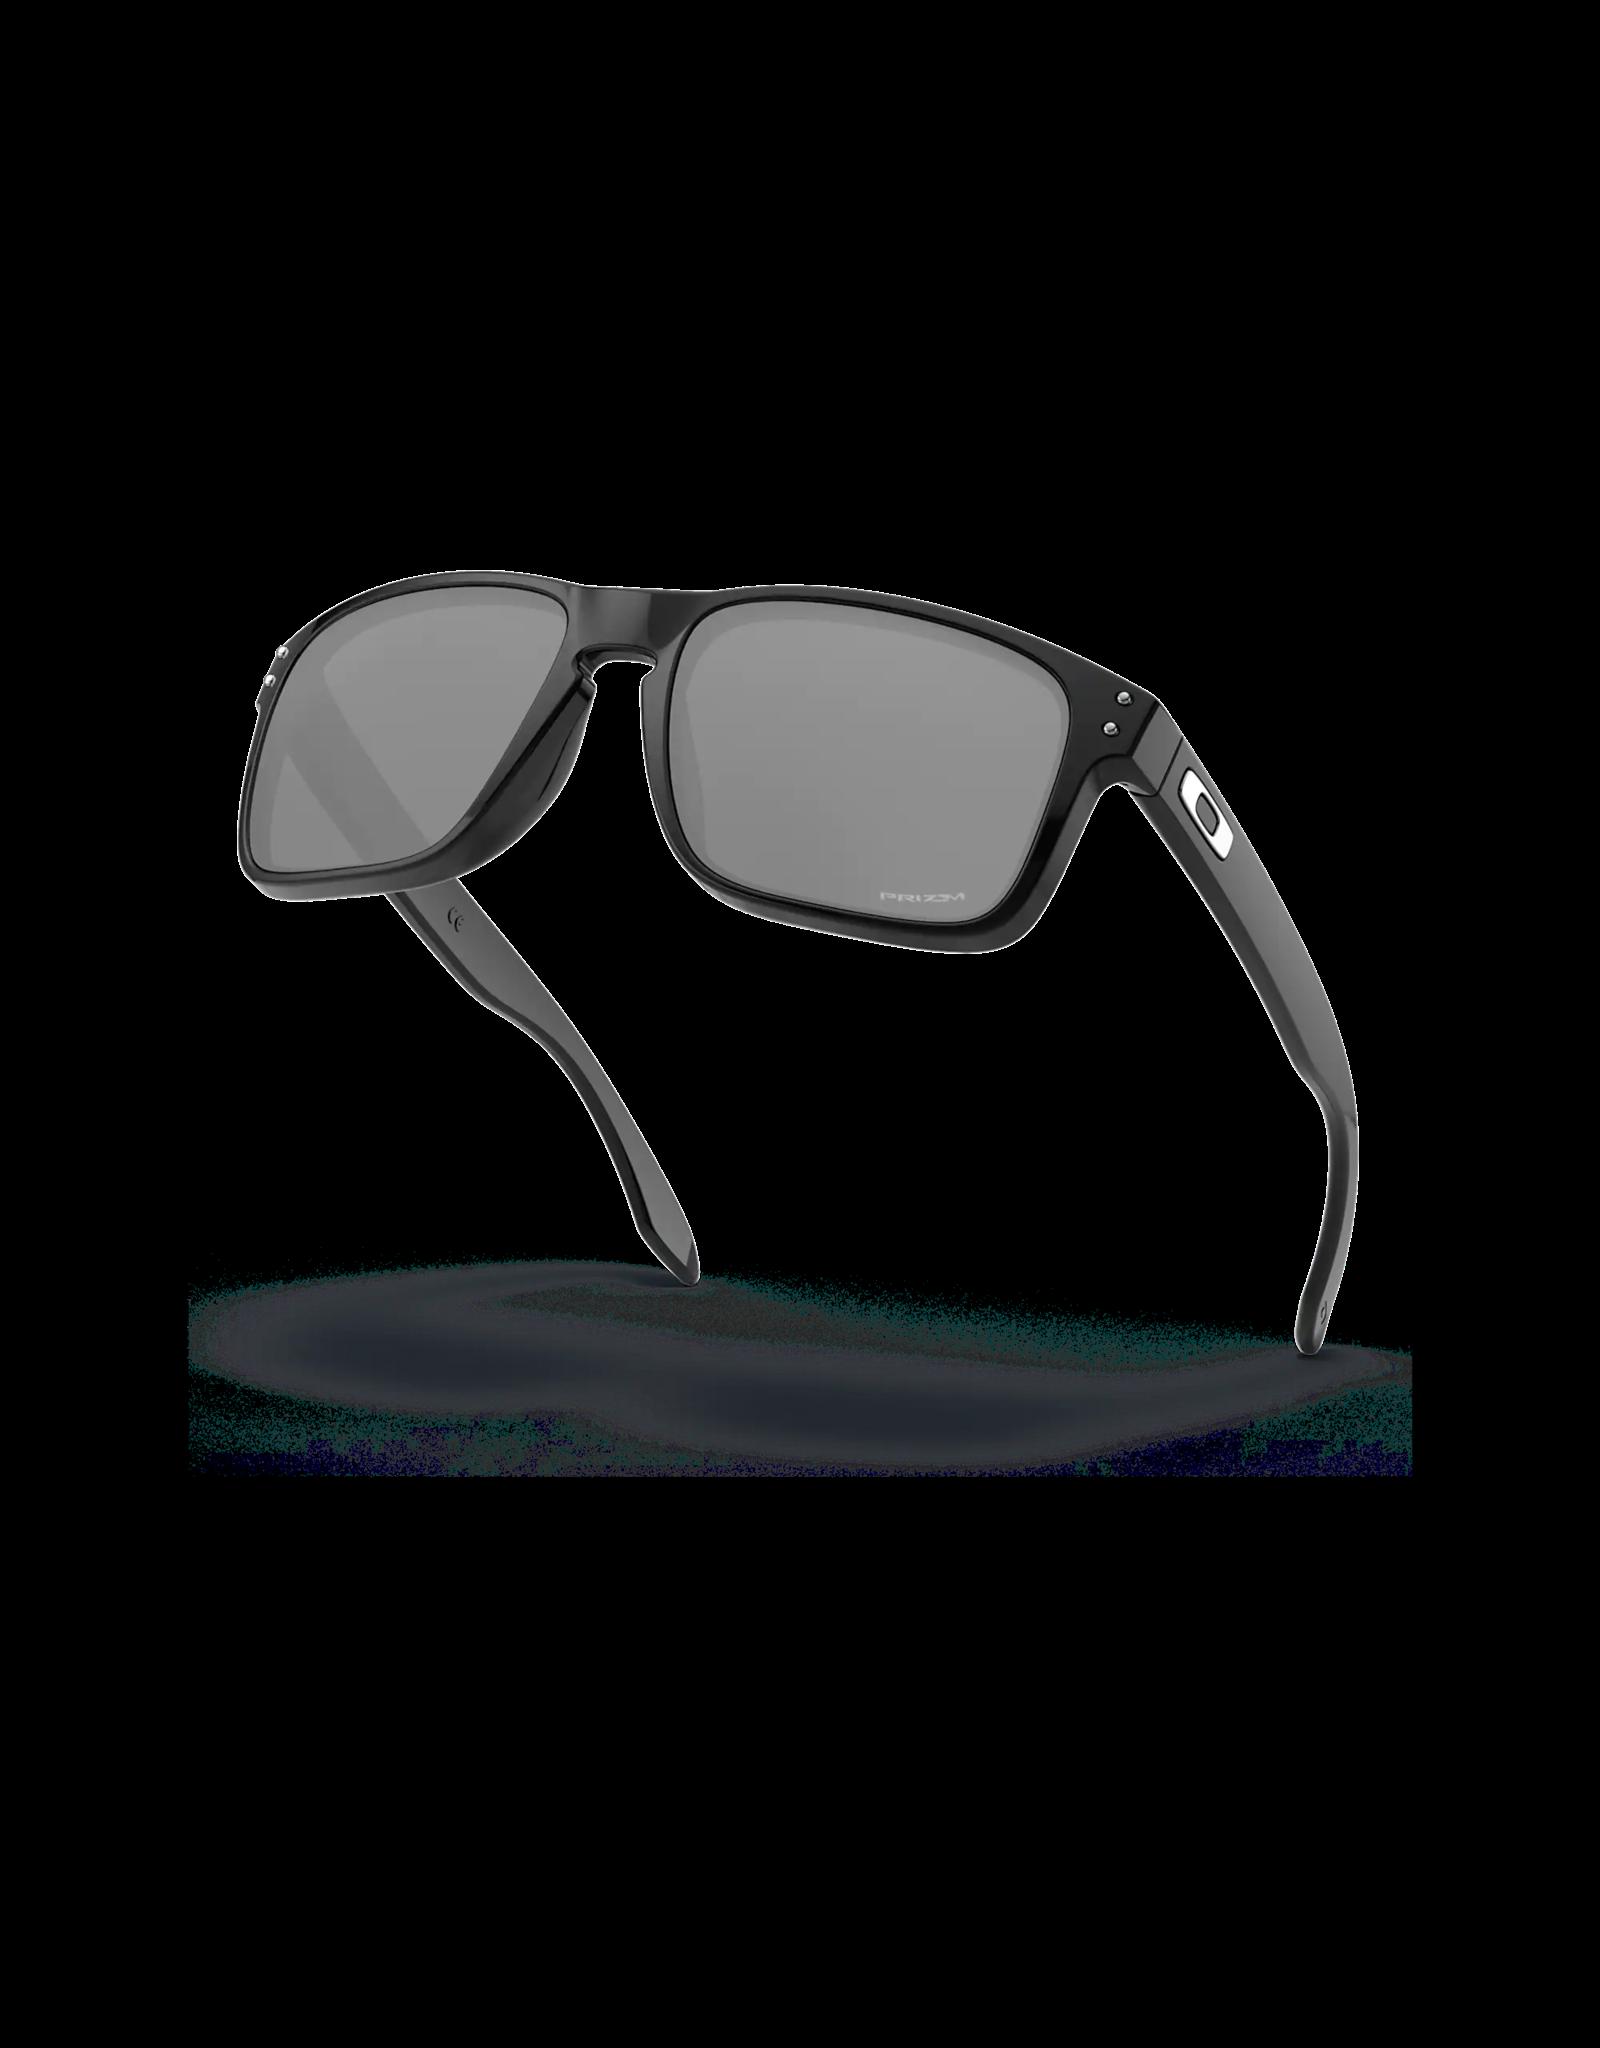 OAKLEY Oakley Holbrook lunette polished black  prizm black iridium